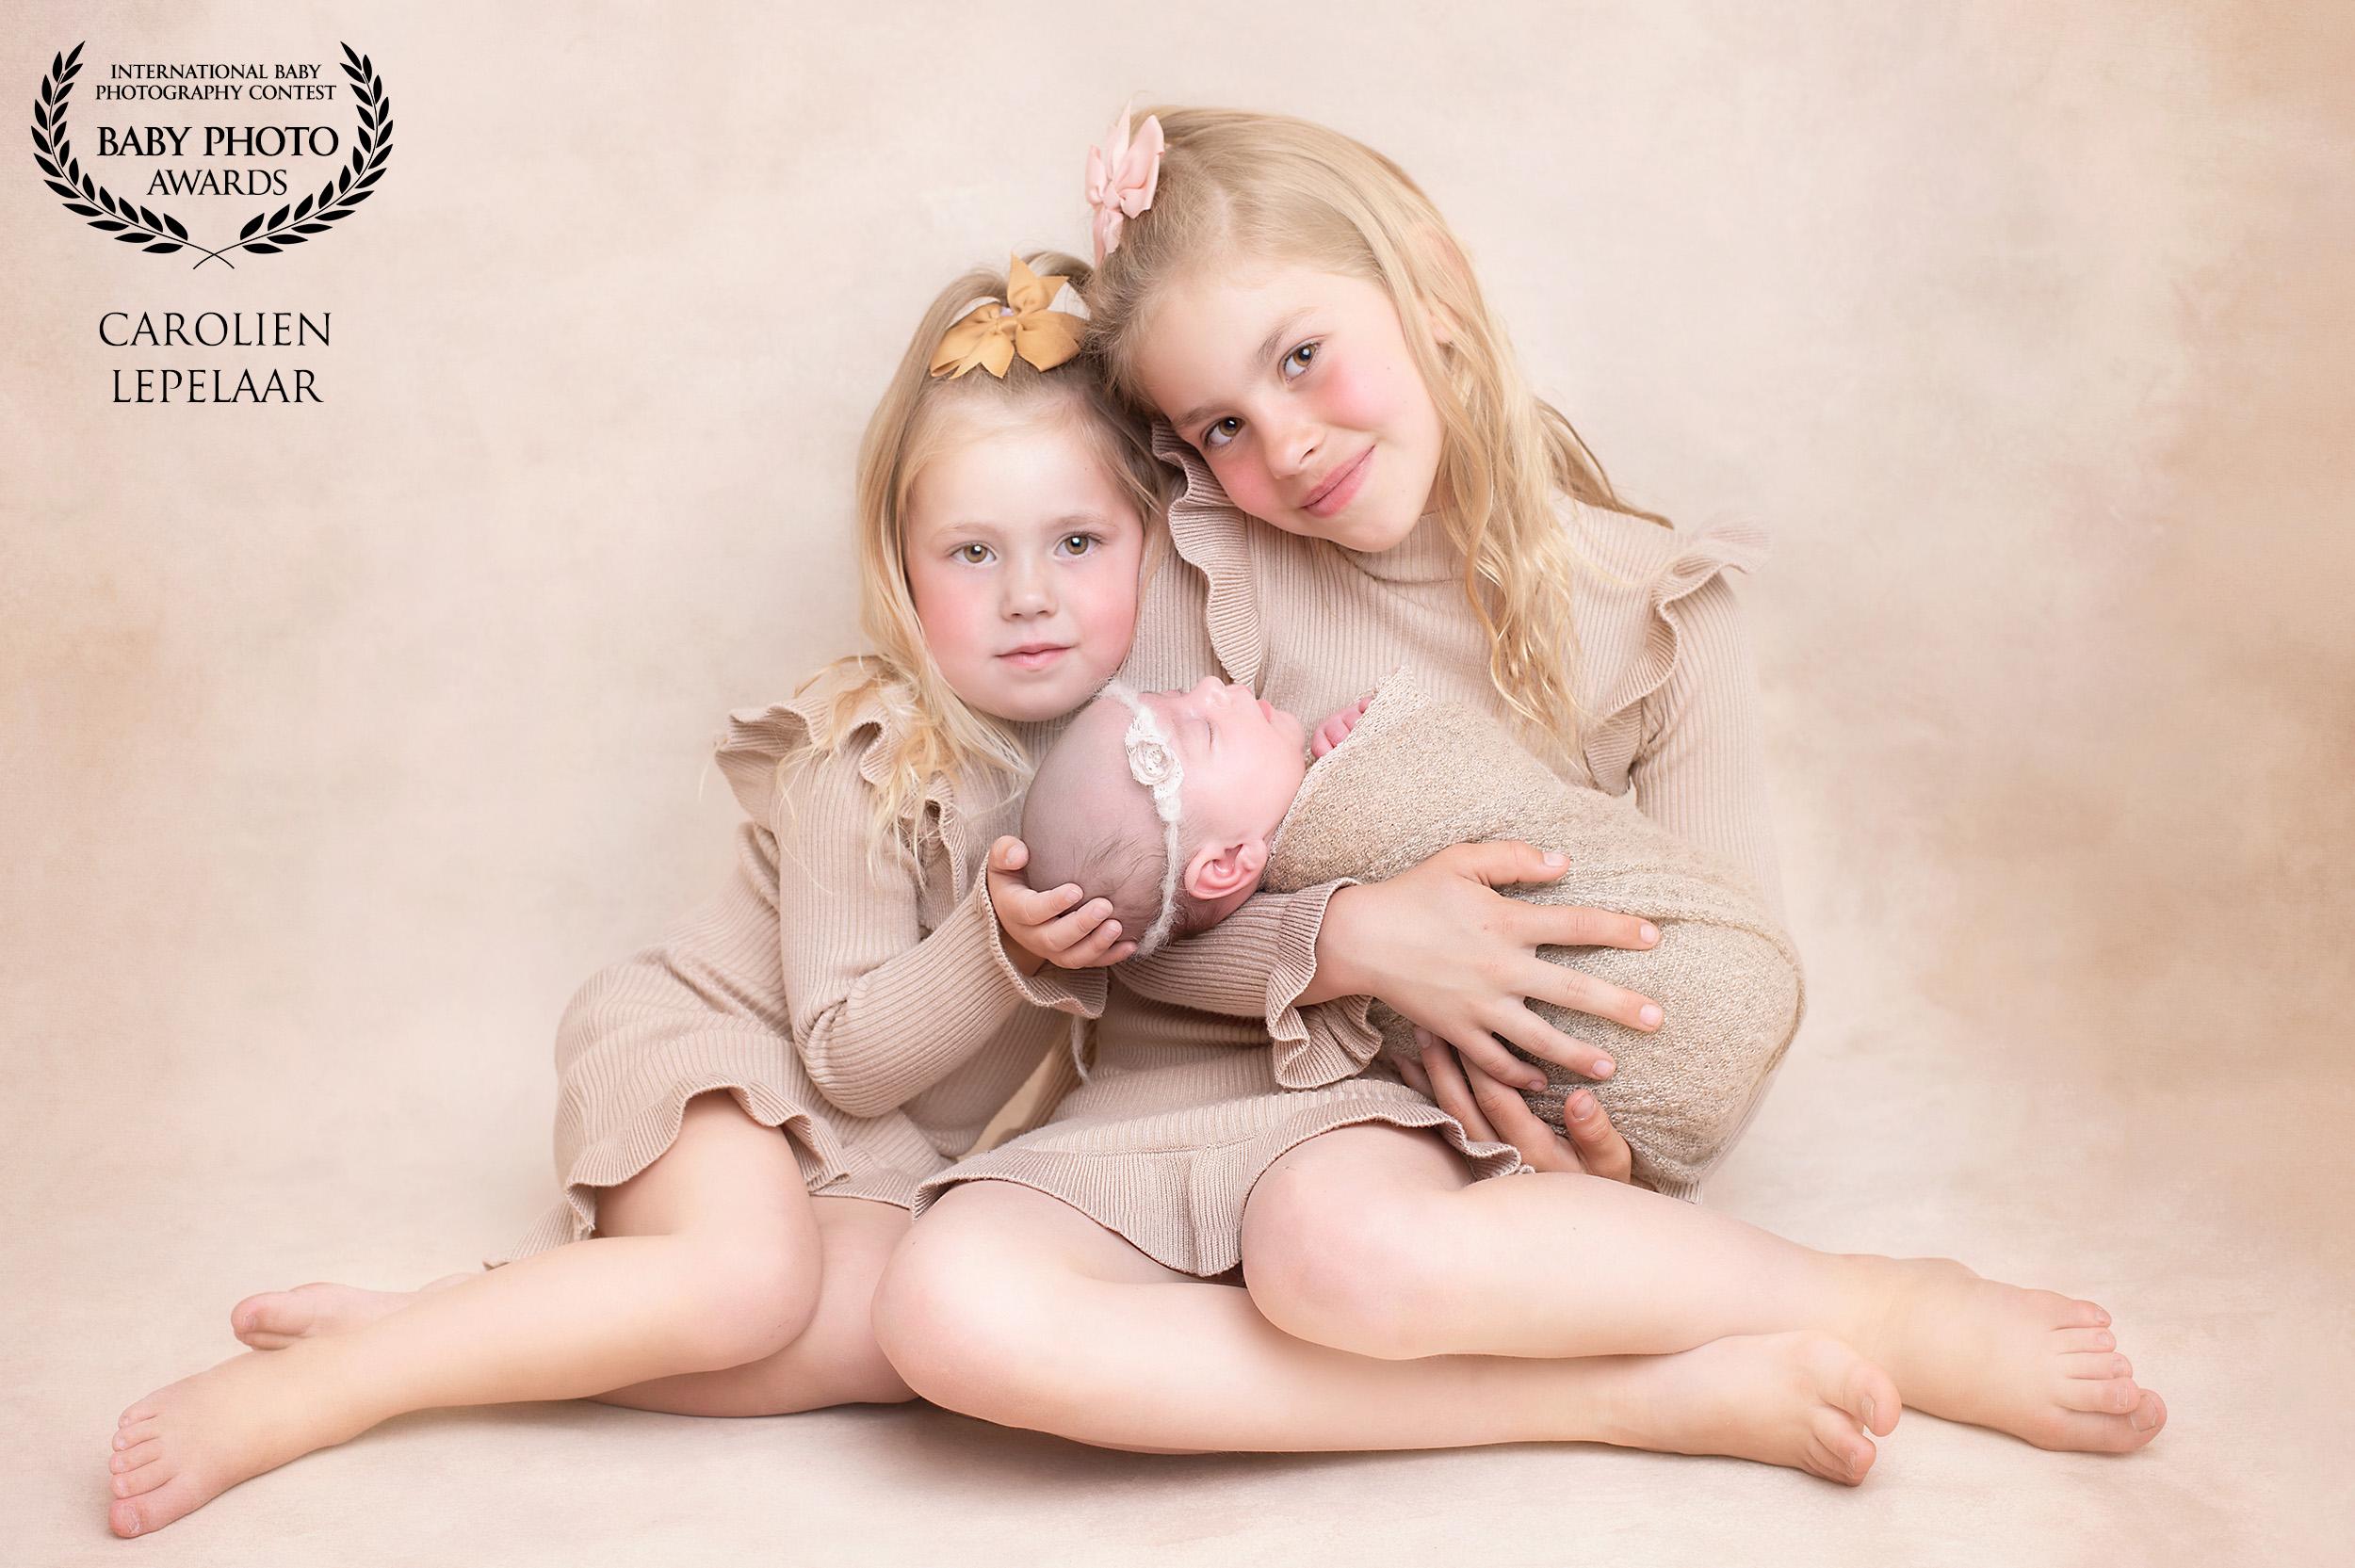 custom_logo_CAROLIEN-LEPELAAR-netherlands-50collection-babyphotoawards-com_1591820149